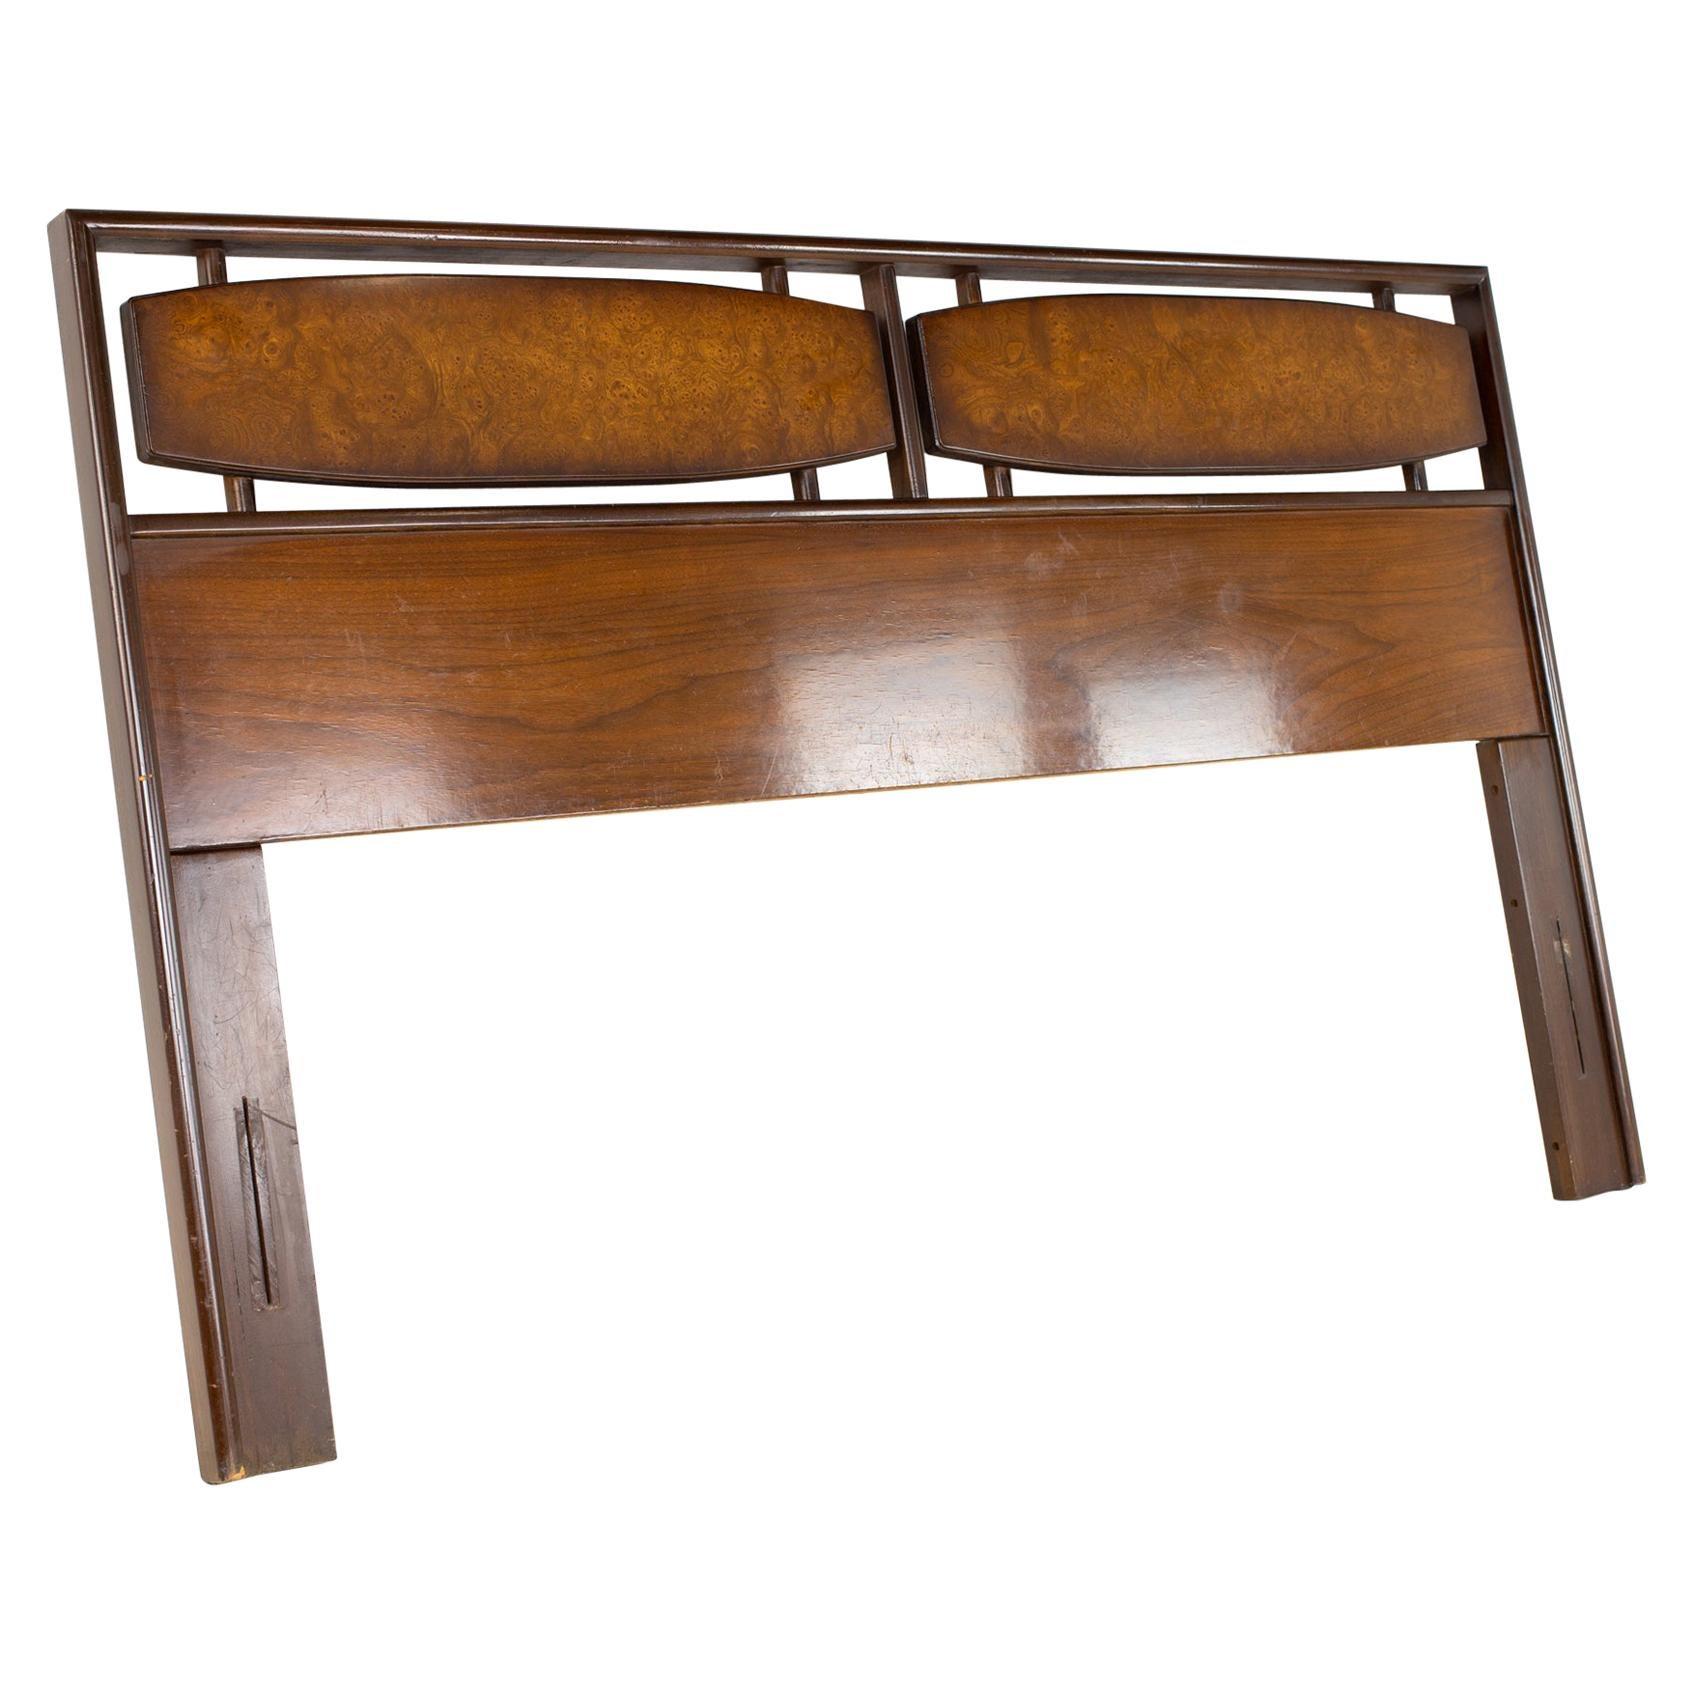 Hoke Wood Products Mid Century Queen Headboard